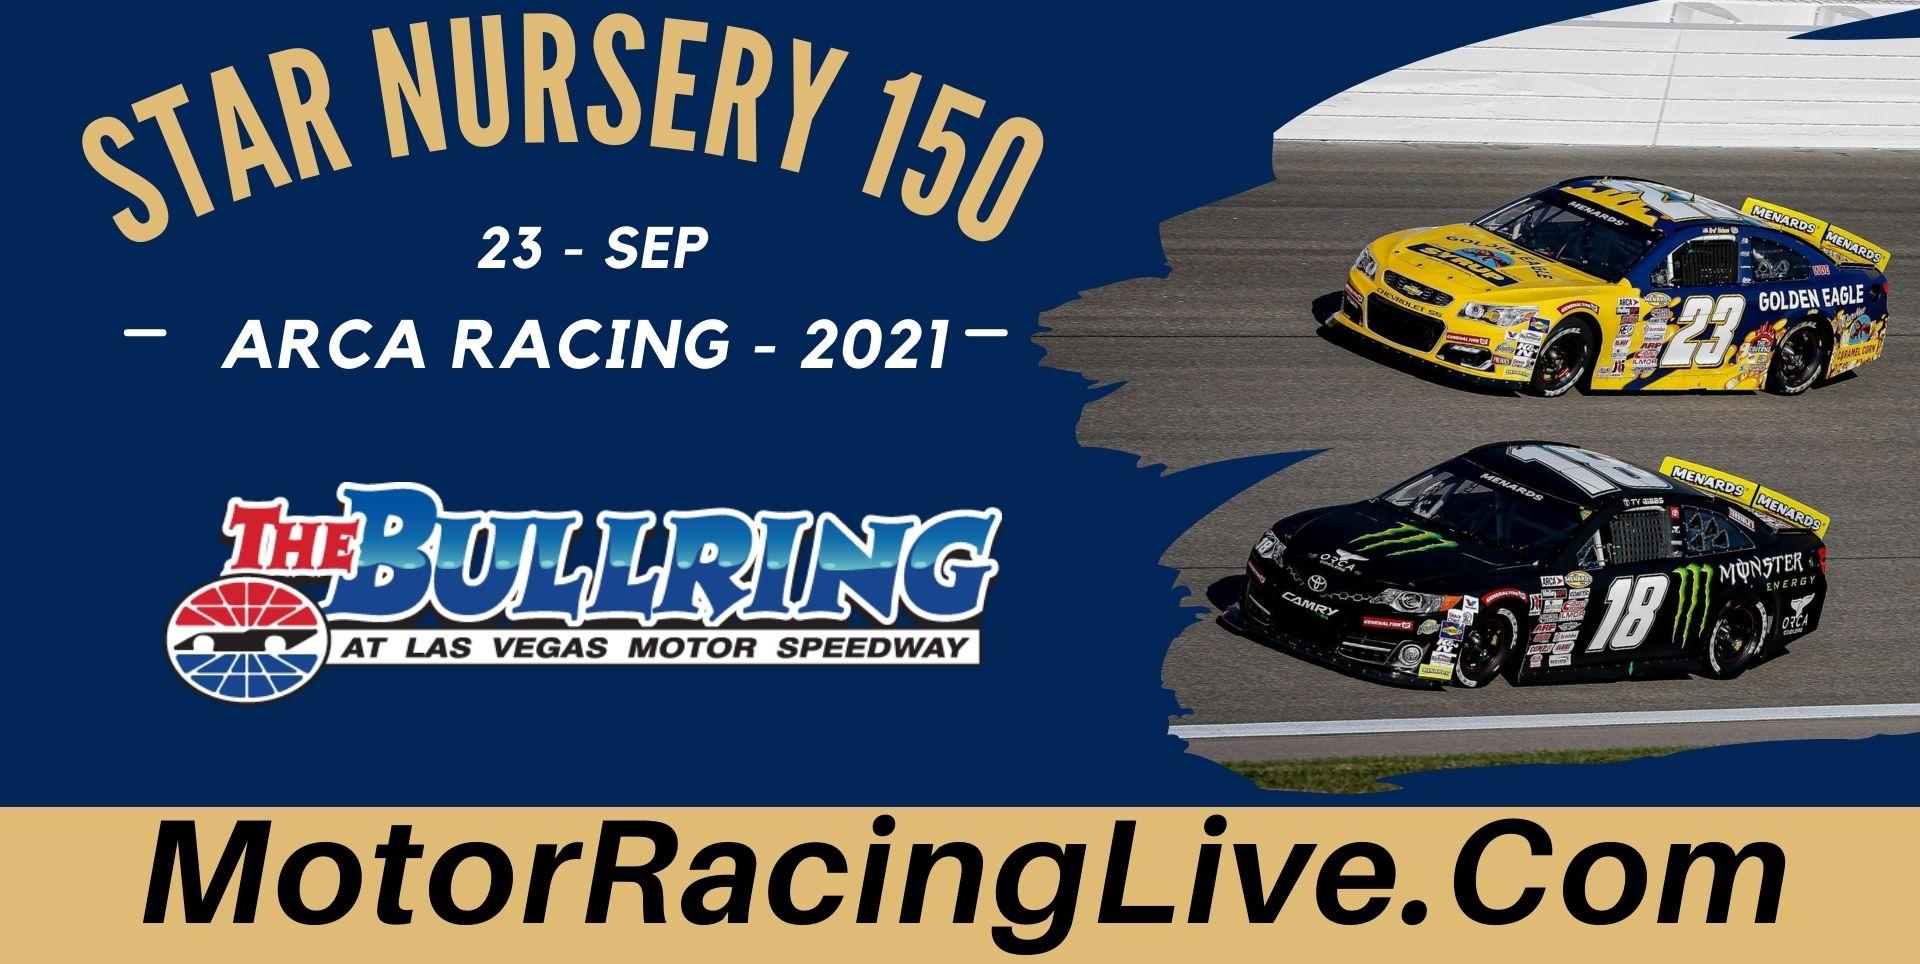 Star Nursery 150 Live Stream: ARCA Racing 2021